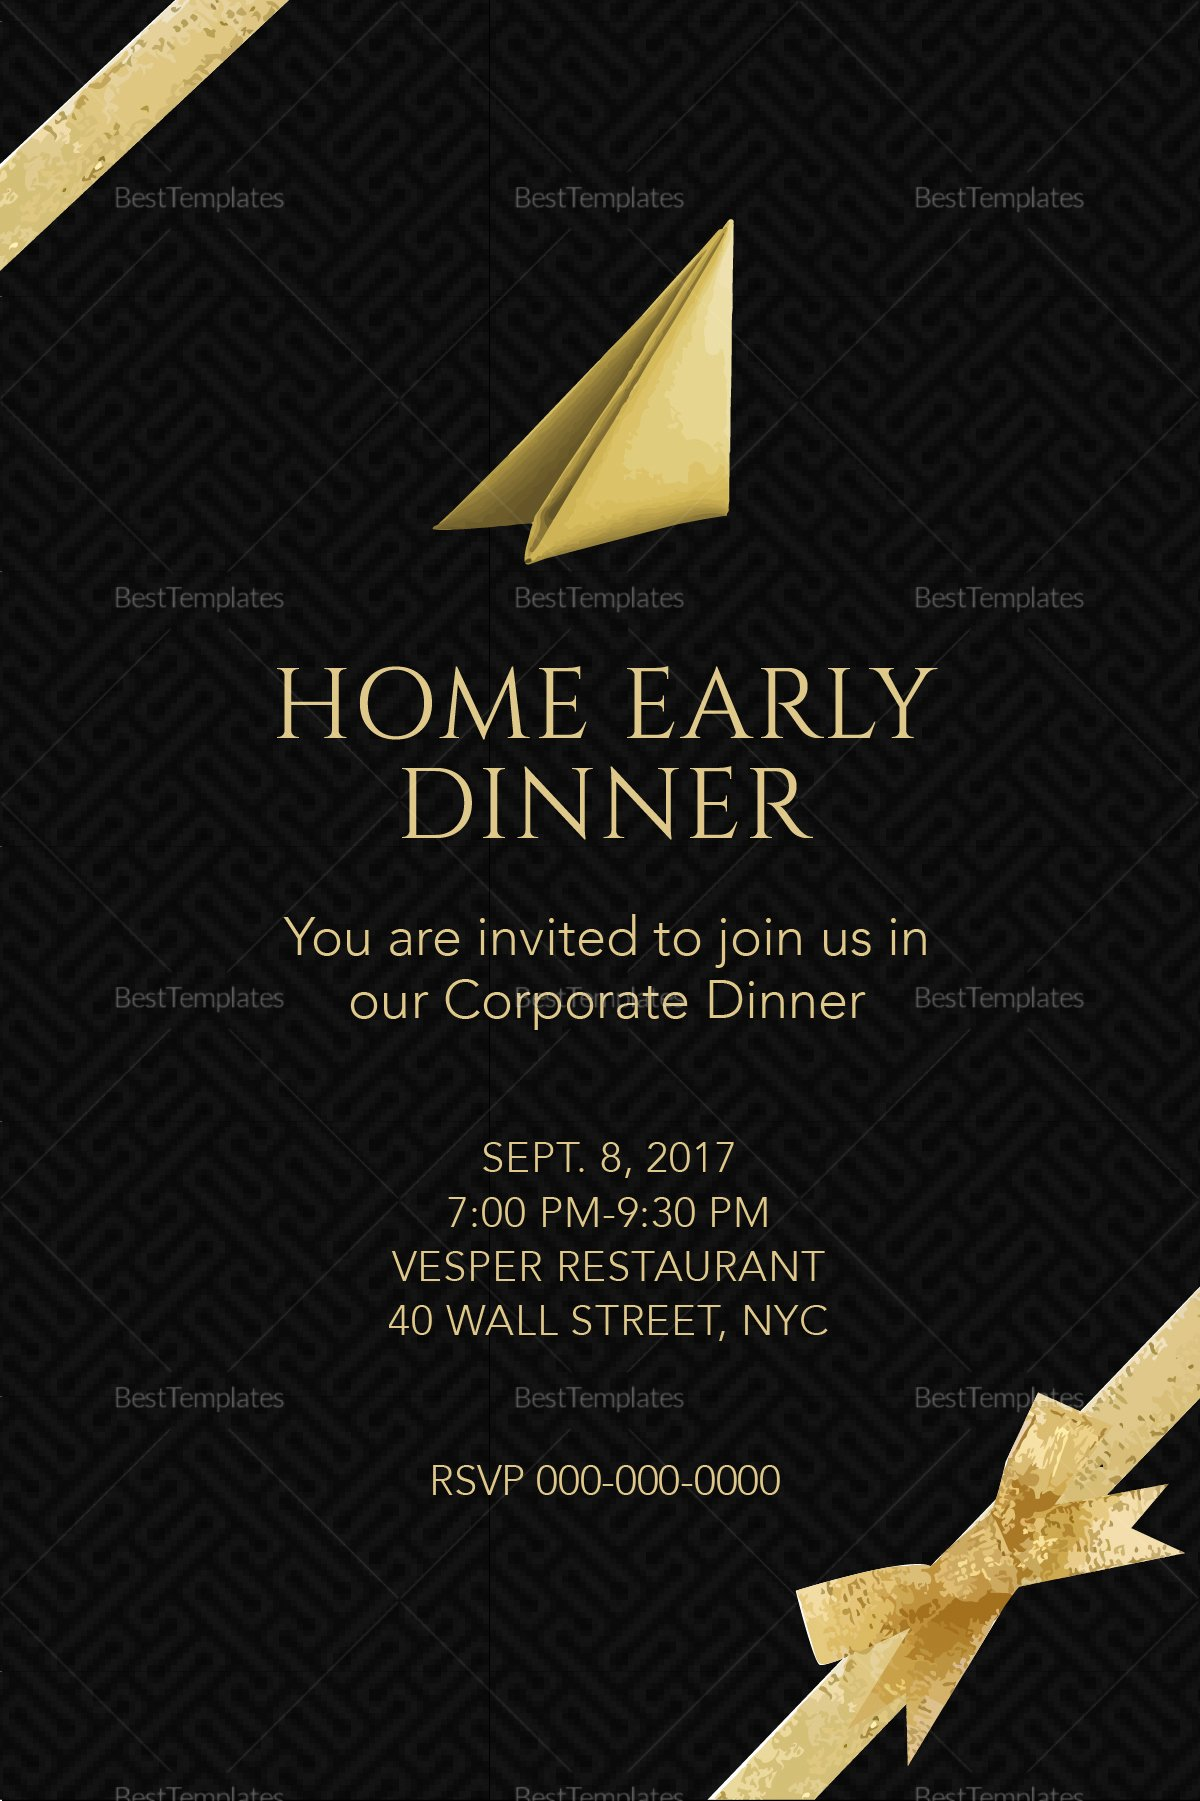 Dinner Invite Template Word Unique Corporate Dinner Invitation Design Template In Psd Word